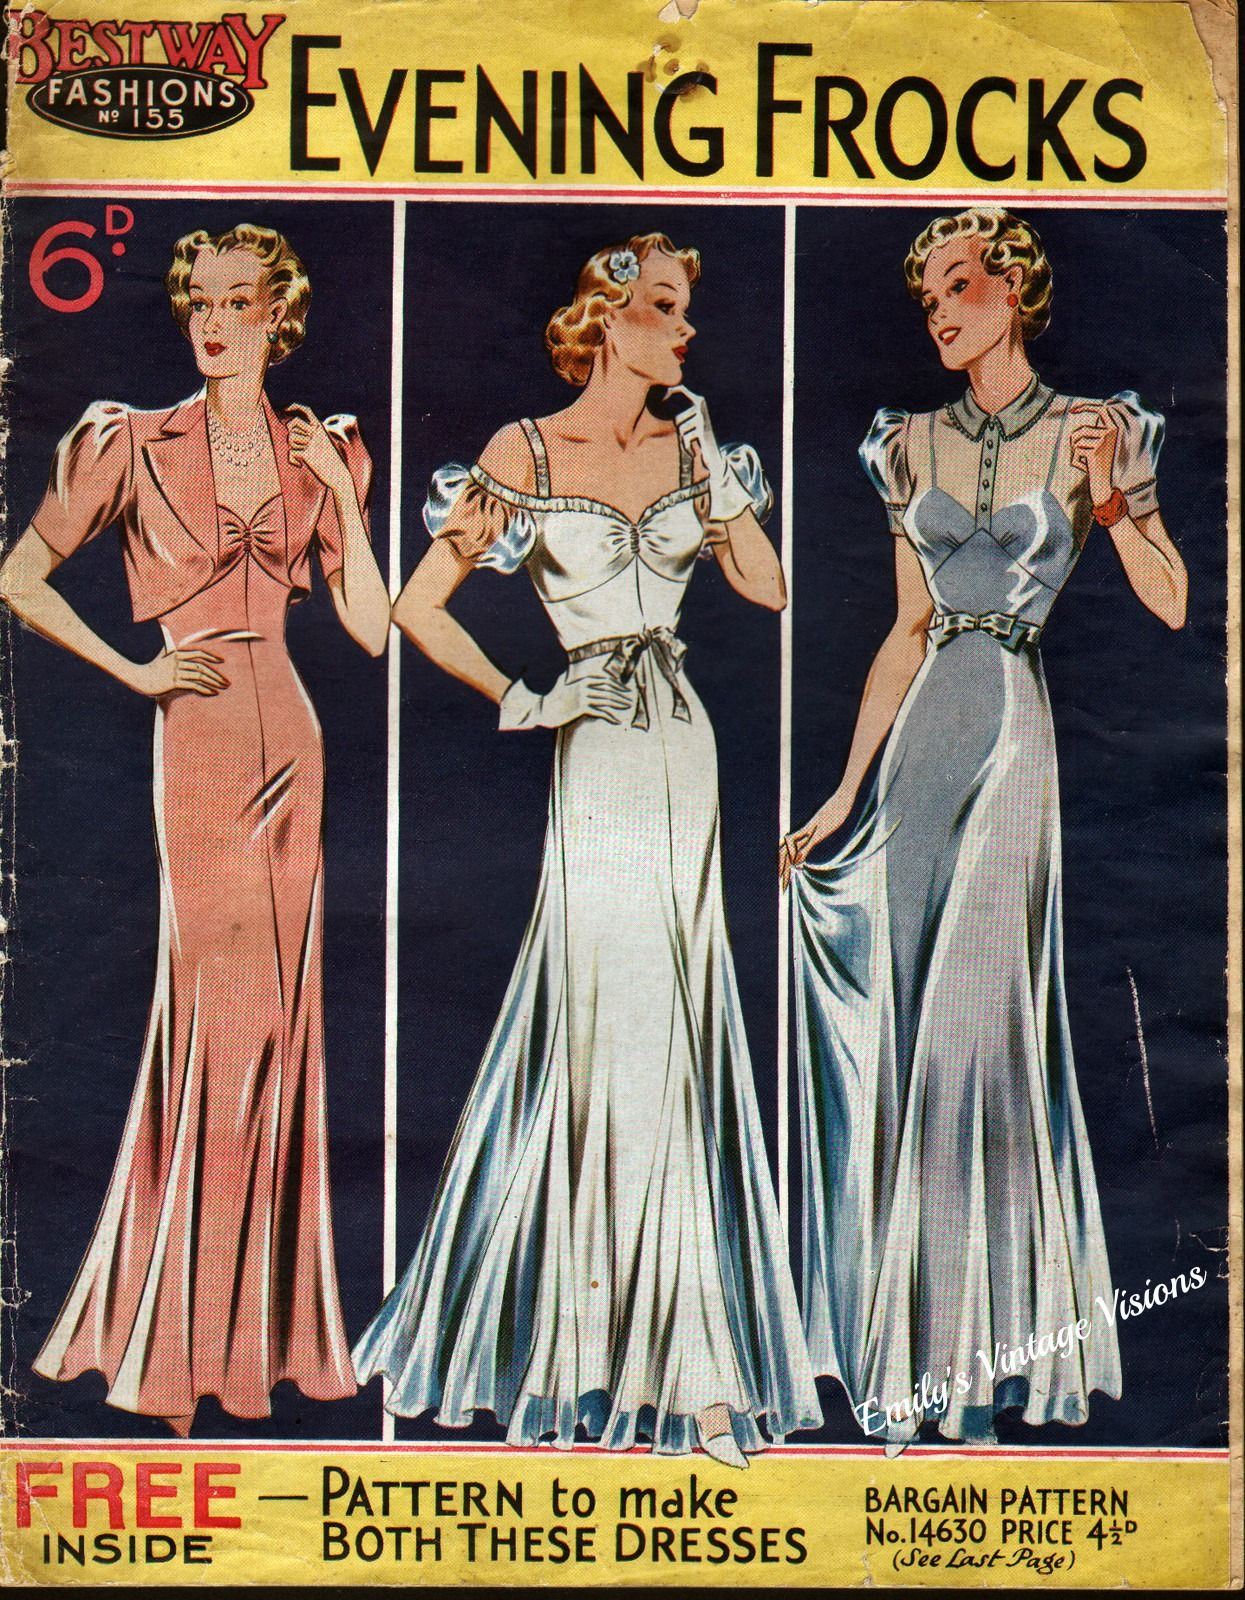 1930s Vintage Evening Dress Patterns 1930s Bestway Fashions Pattern Catalog For Evening Evening Dress Patterns Evening Dresses Vintage Vintage Evening Gowns [ 1600 x 1245 Pixel ]